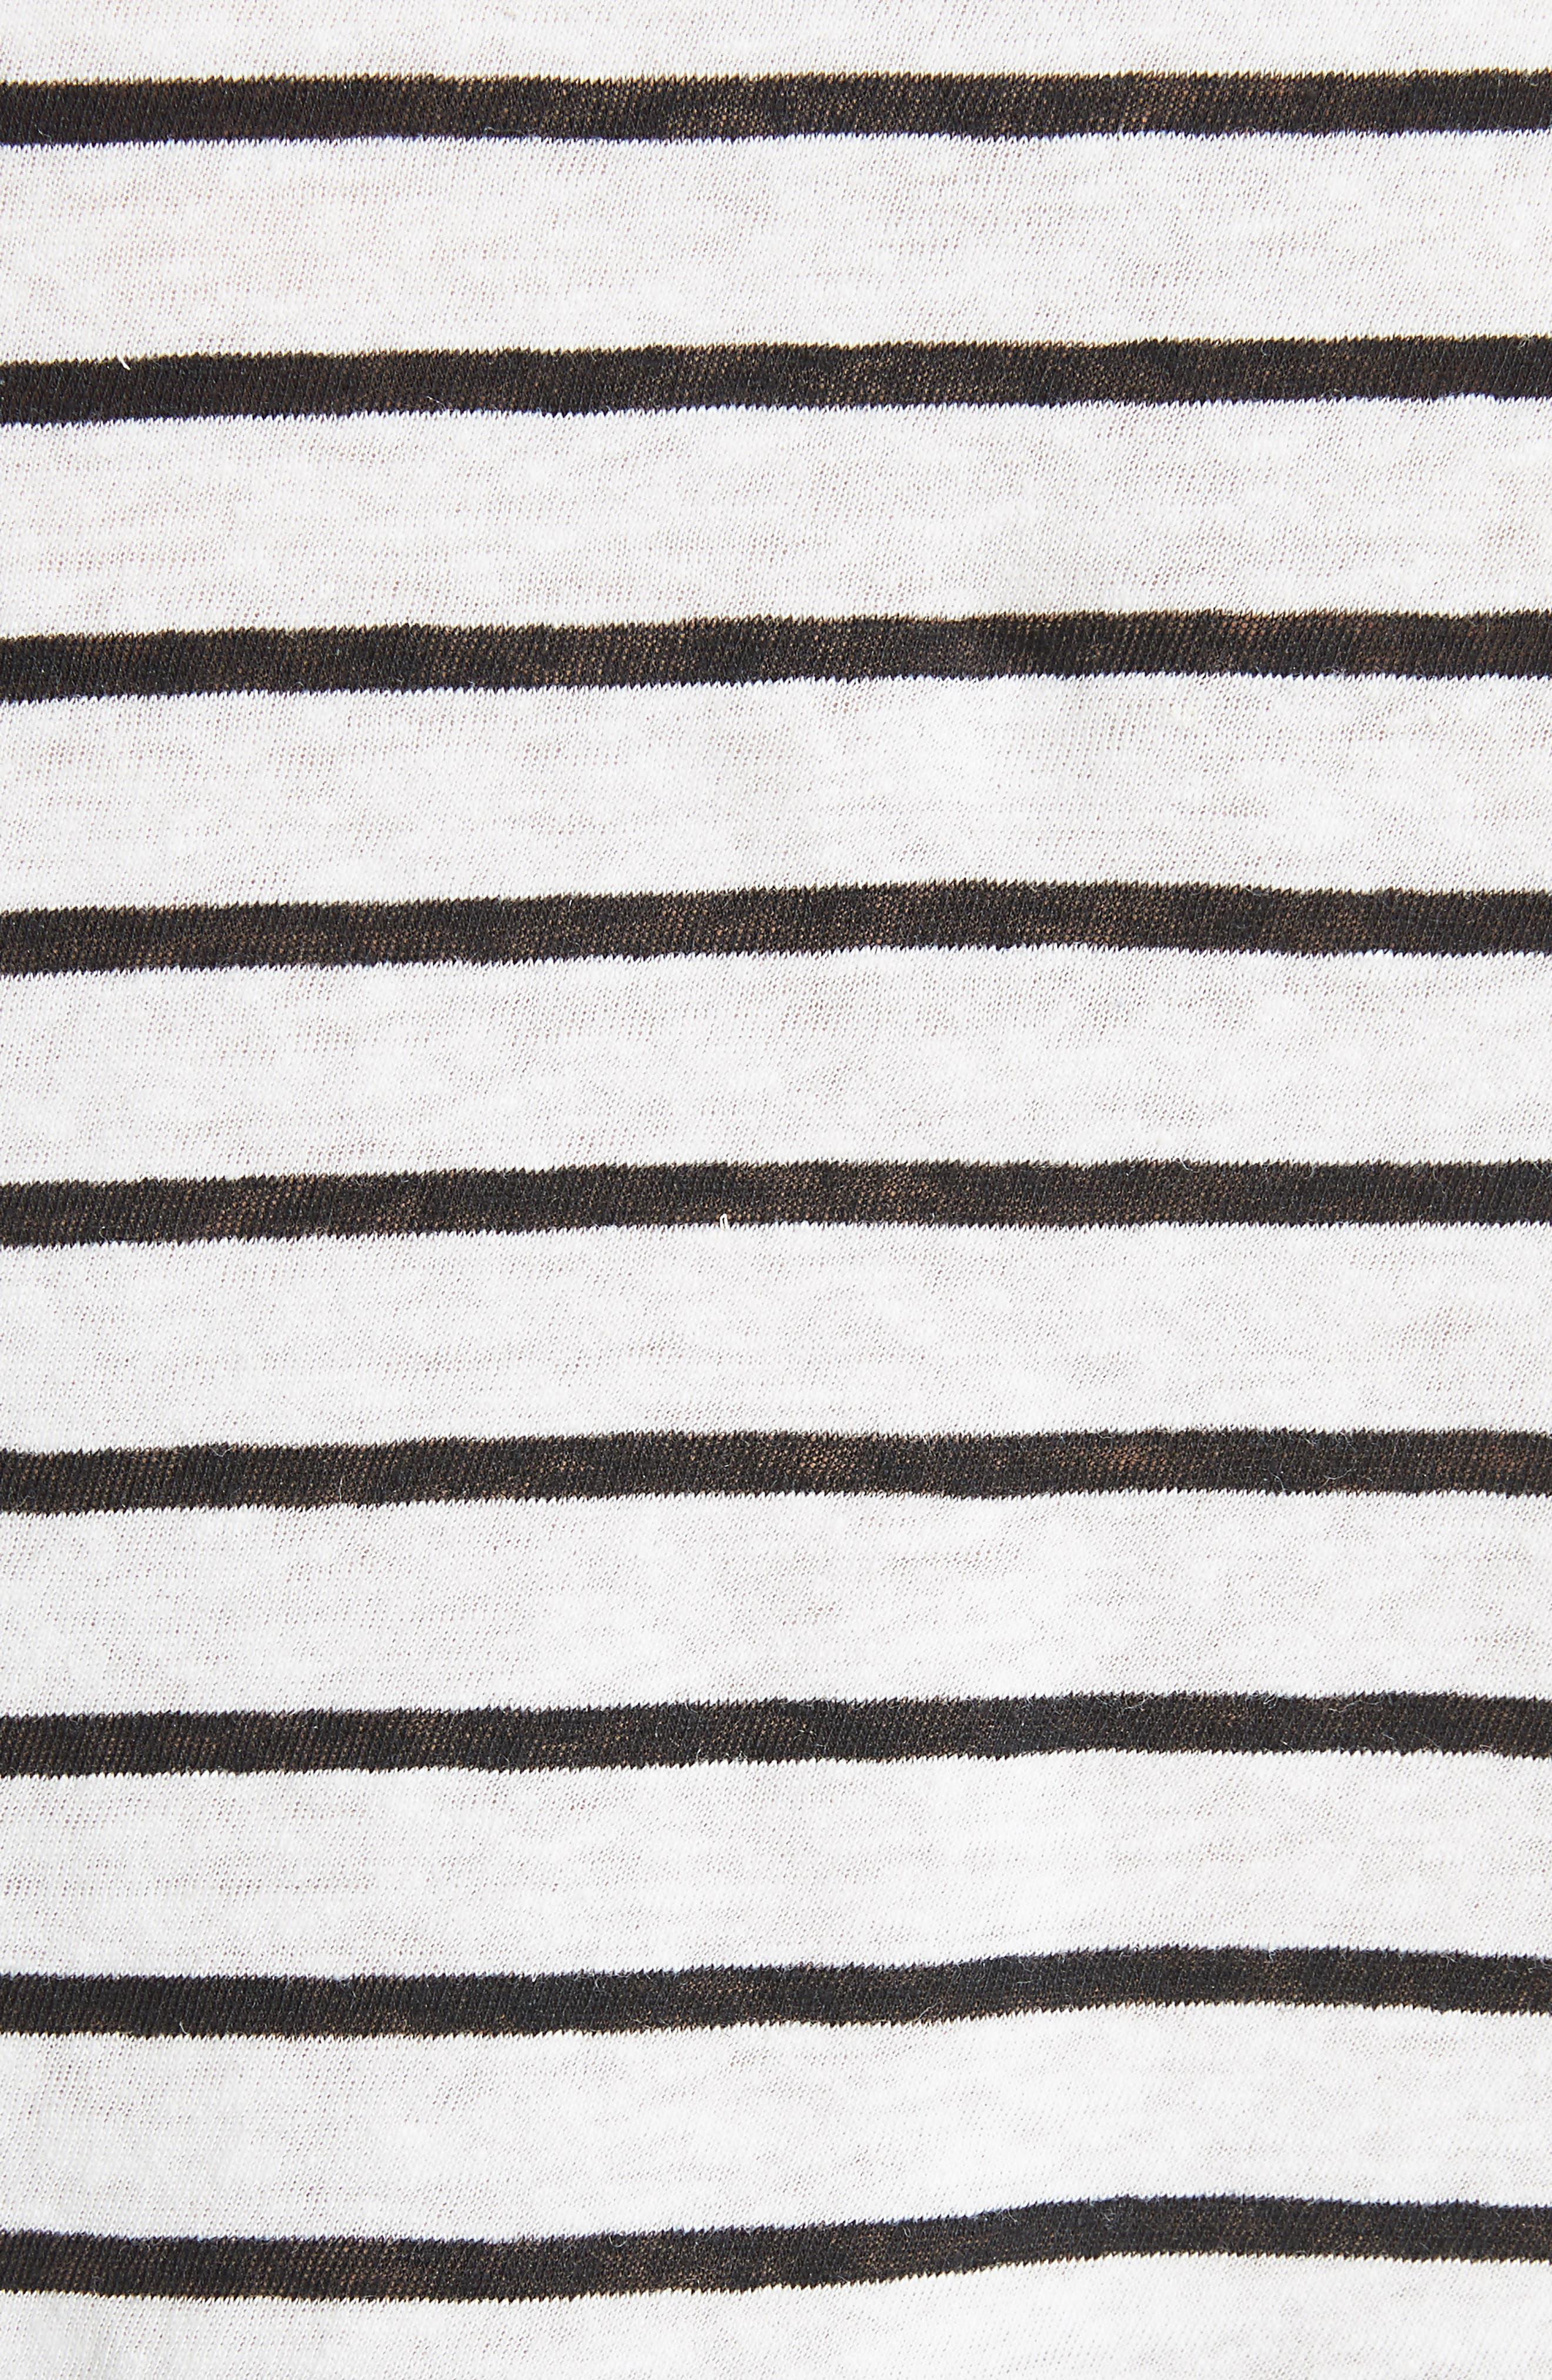 Navigate Stripe Linen Cotton Tee,                             Alternate thumbnail 5, color,                             White/ Black